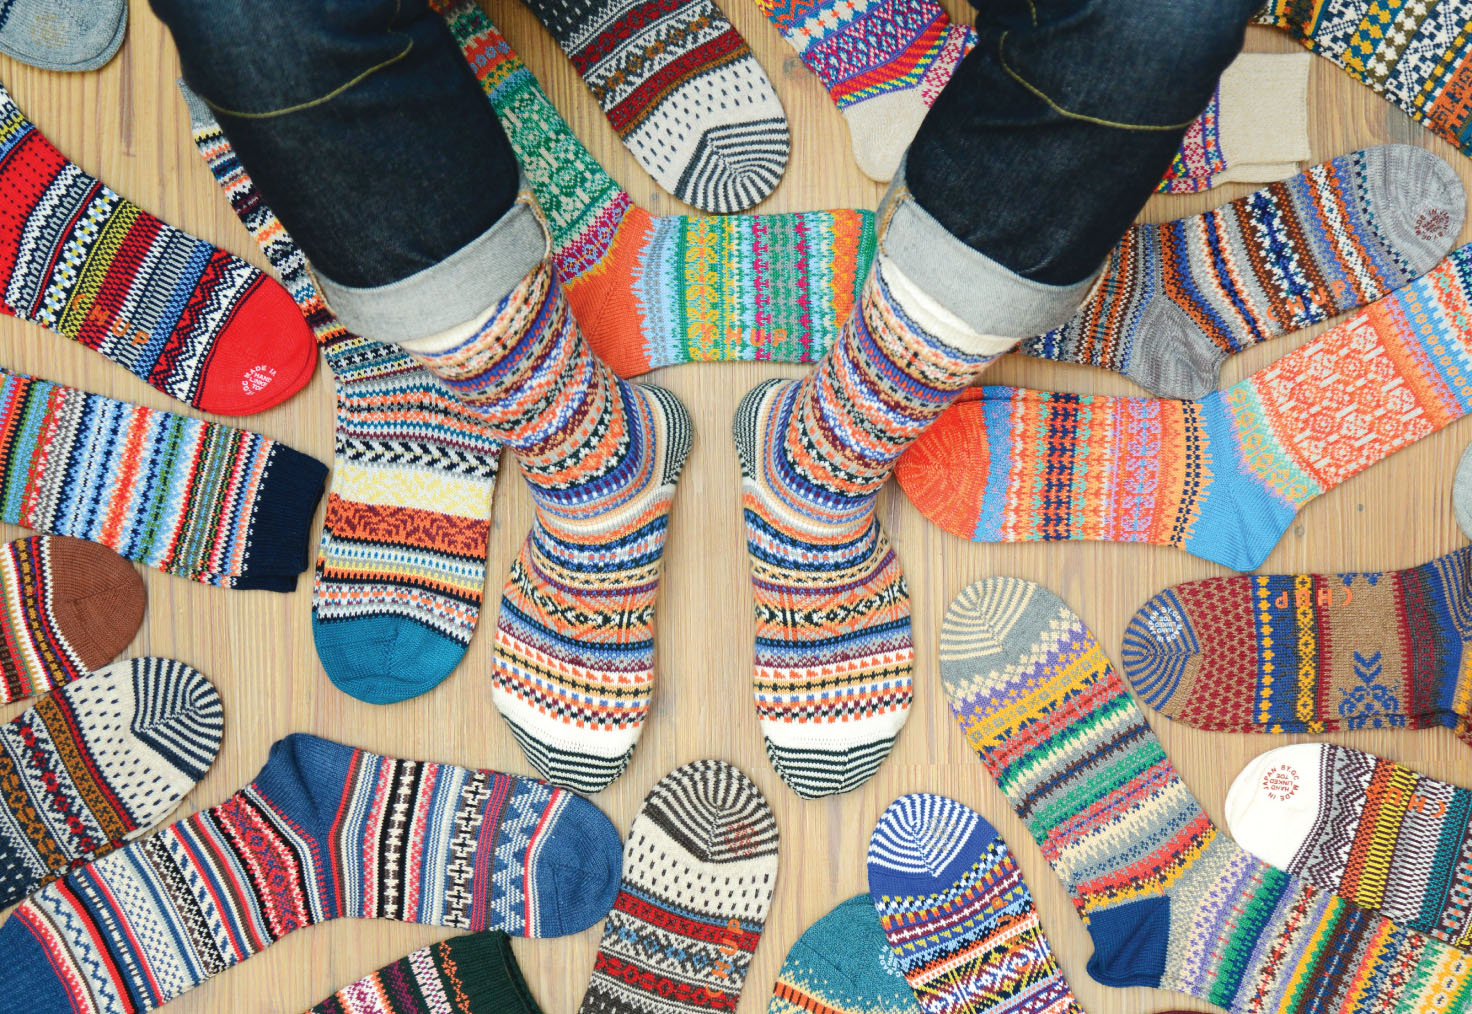 chup-random-socks.jpg